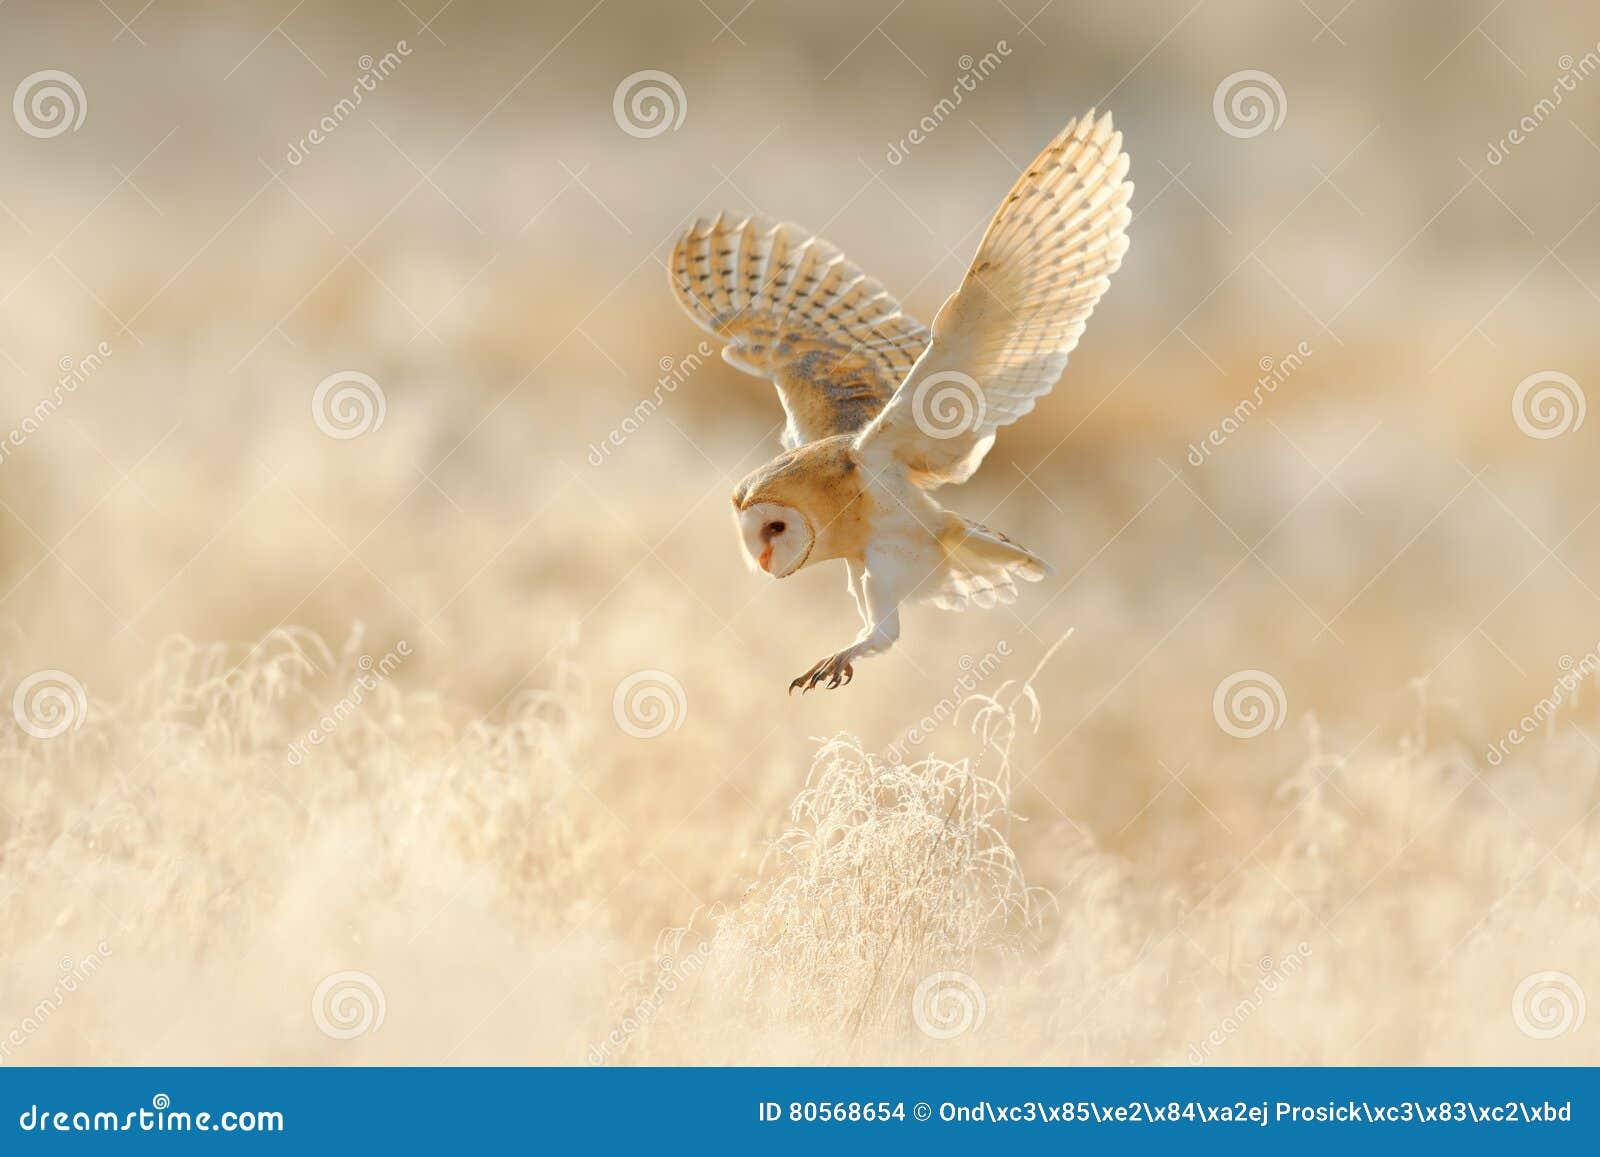 Owl flight. Hunting Barn Owl, wild bird in morning nice light. Beautiful animal in the nature habitat. Owl landing in the grass.